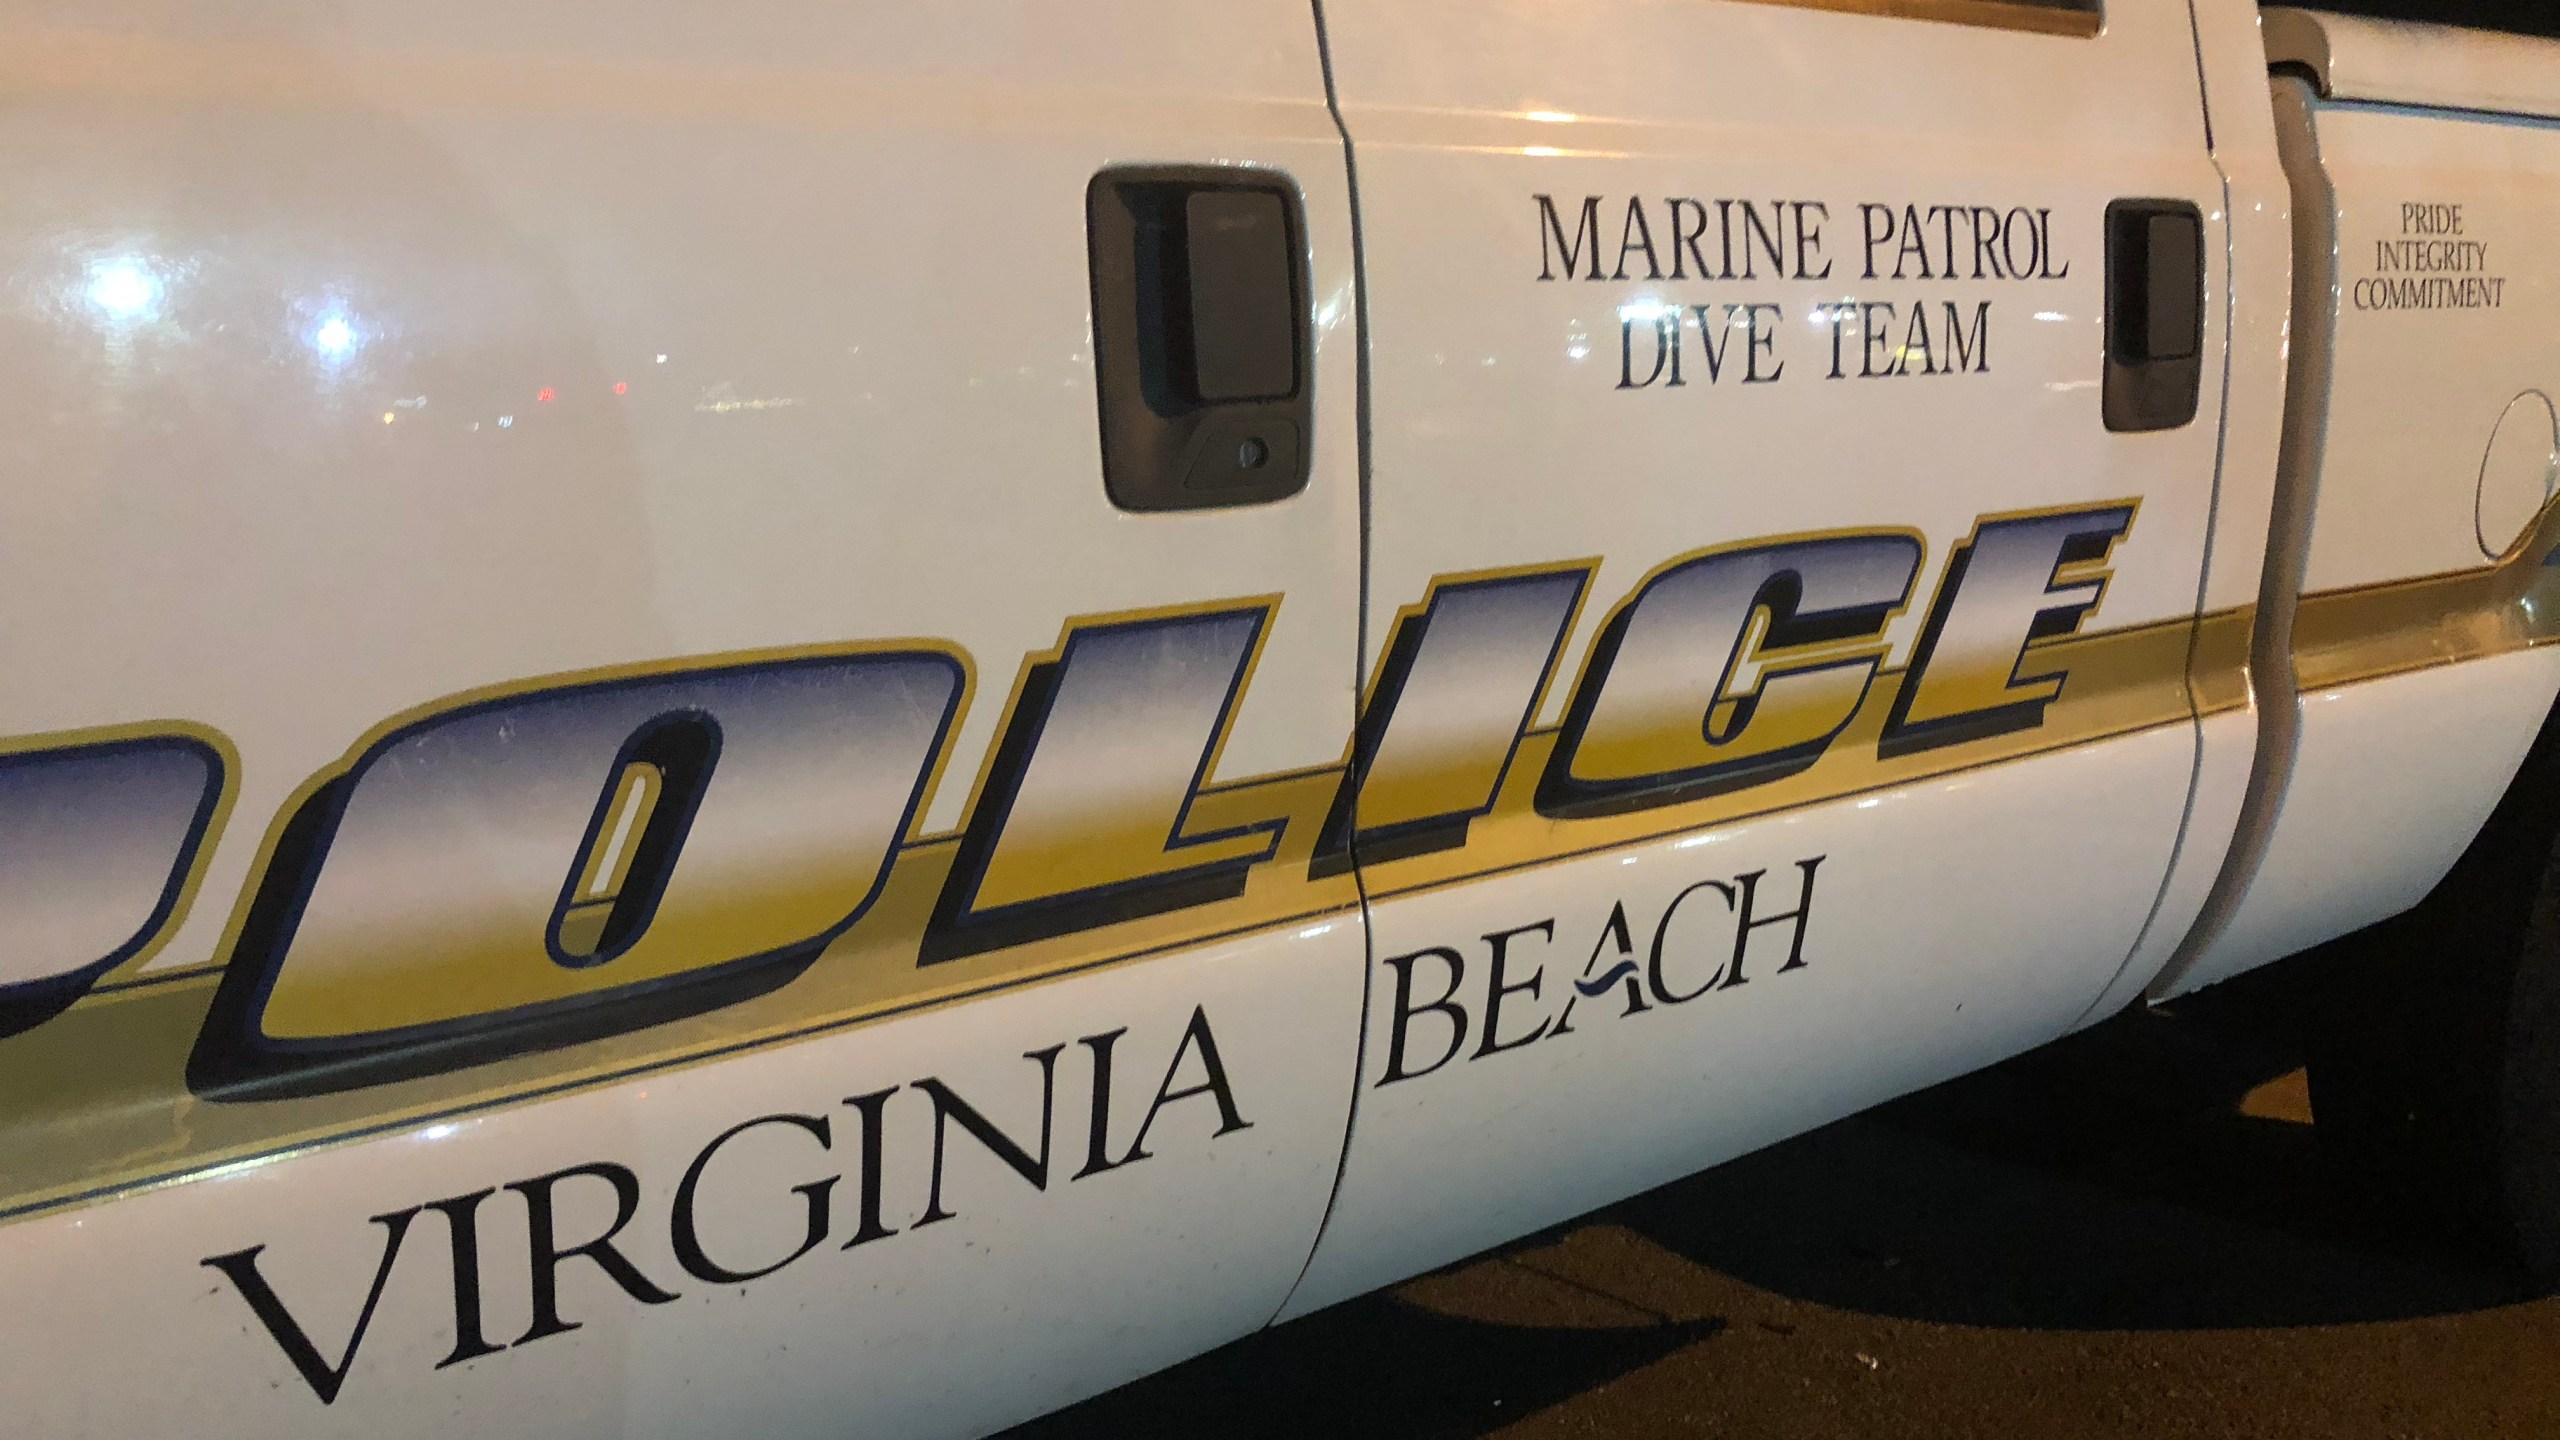 Virginia Beach Police Marine Patrol Dive Team Generic